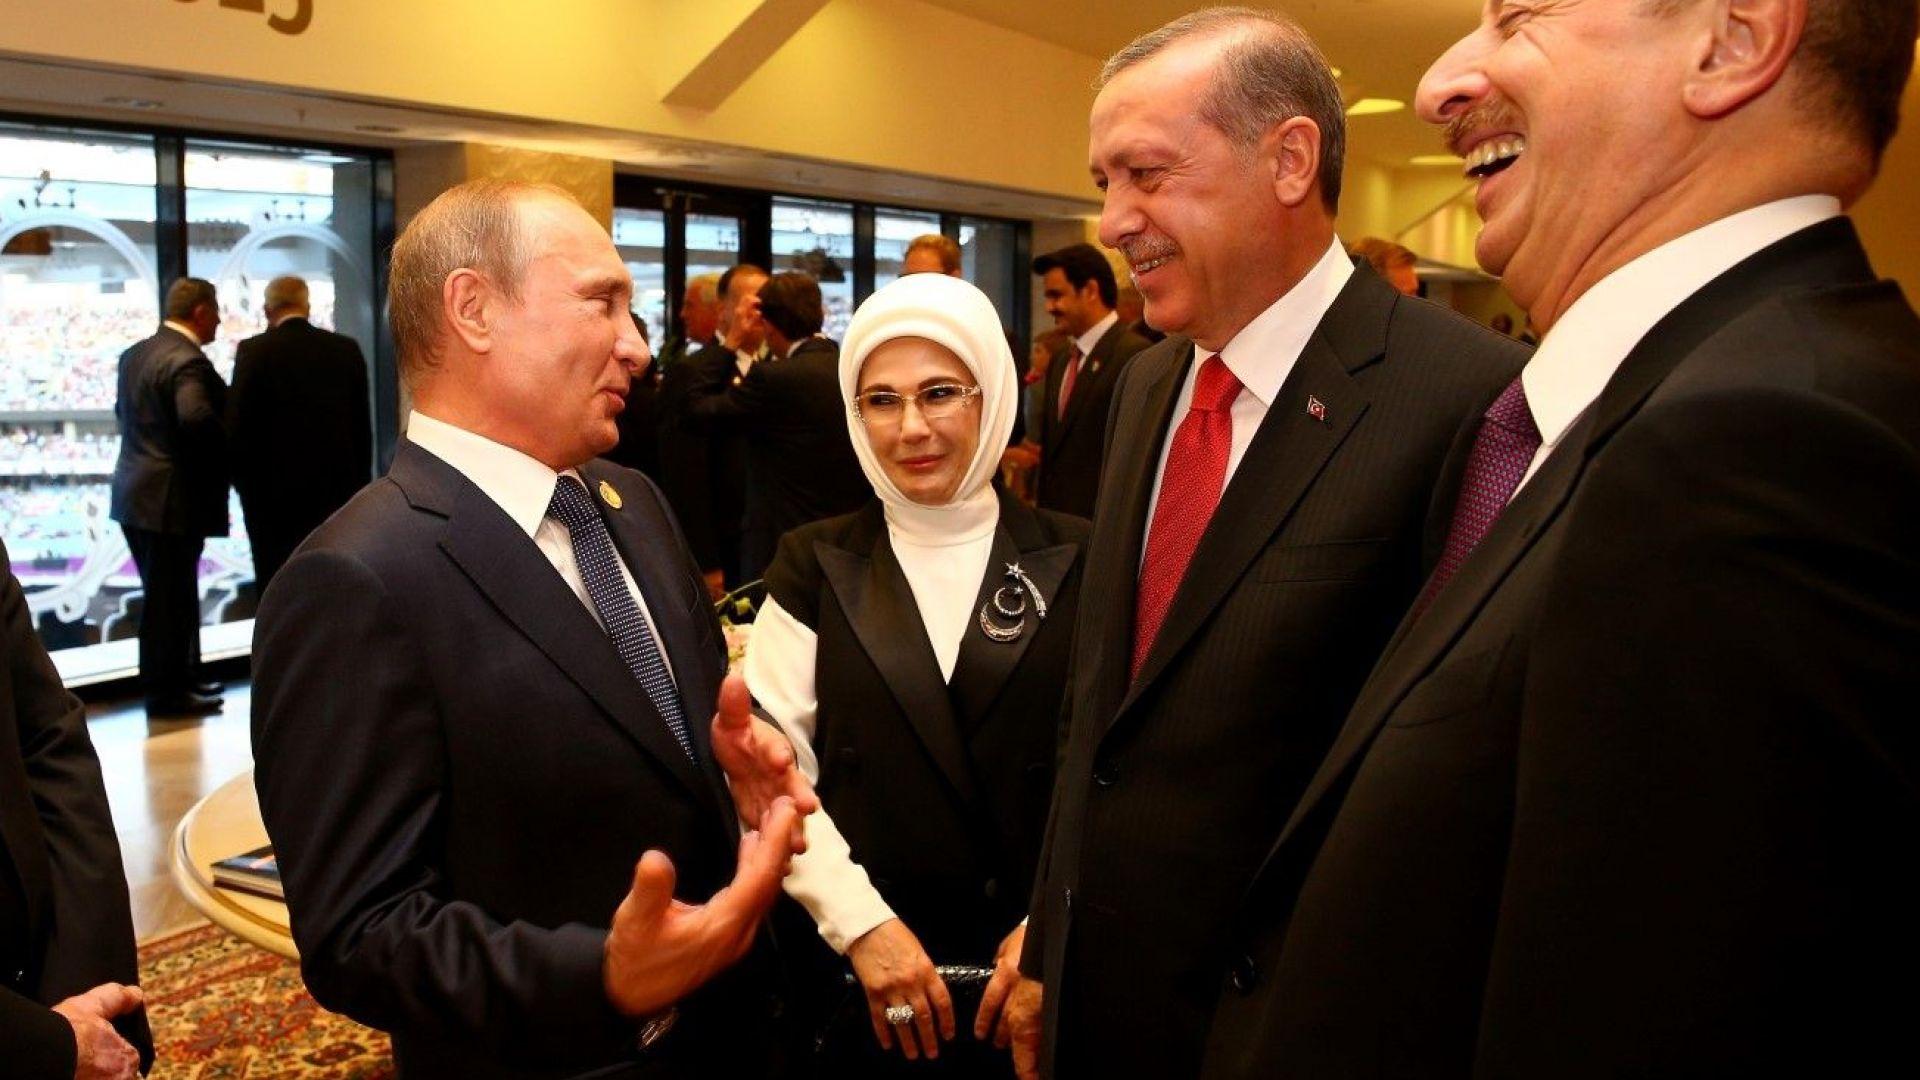 Шеги и закачки след закрита среща на Путин и Ердоган